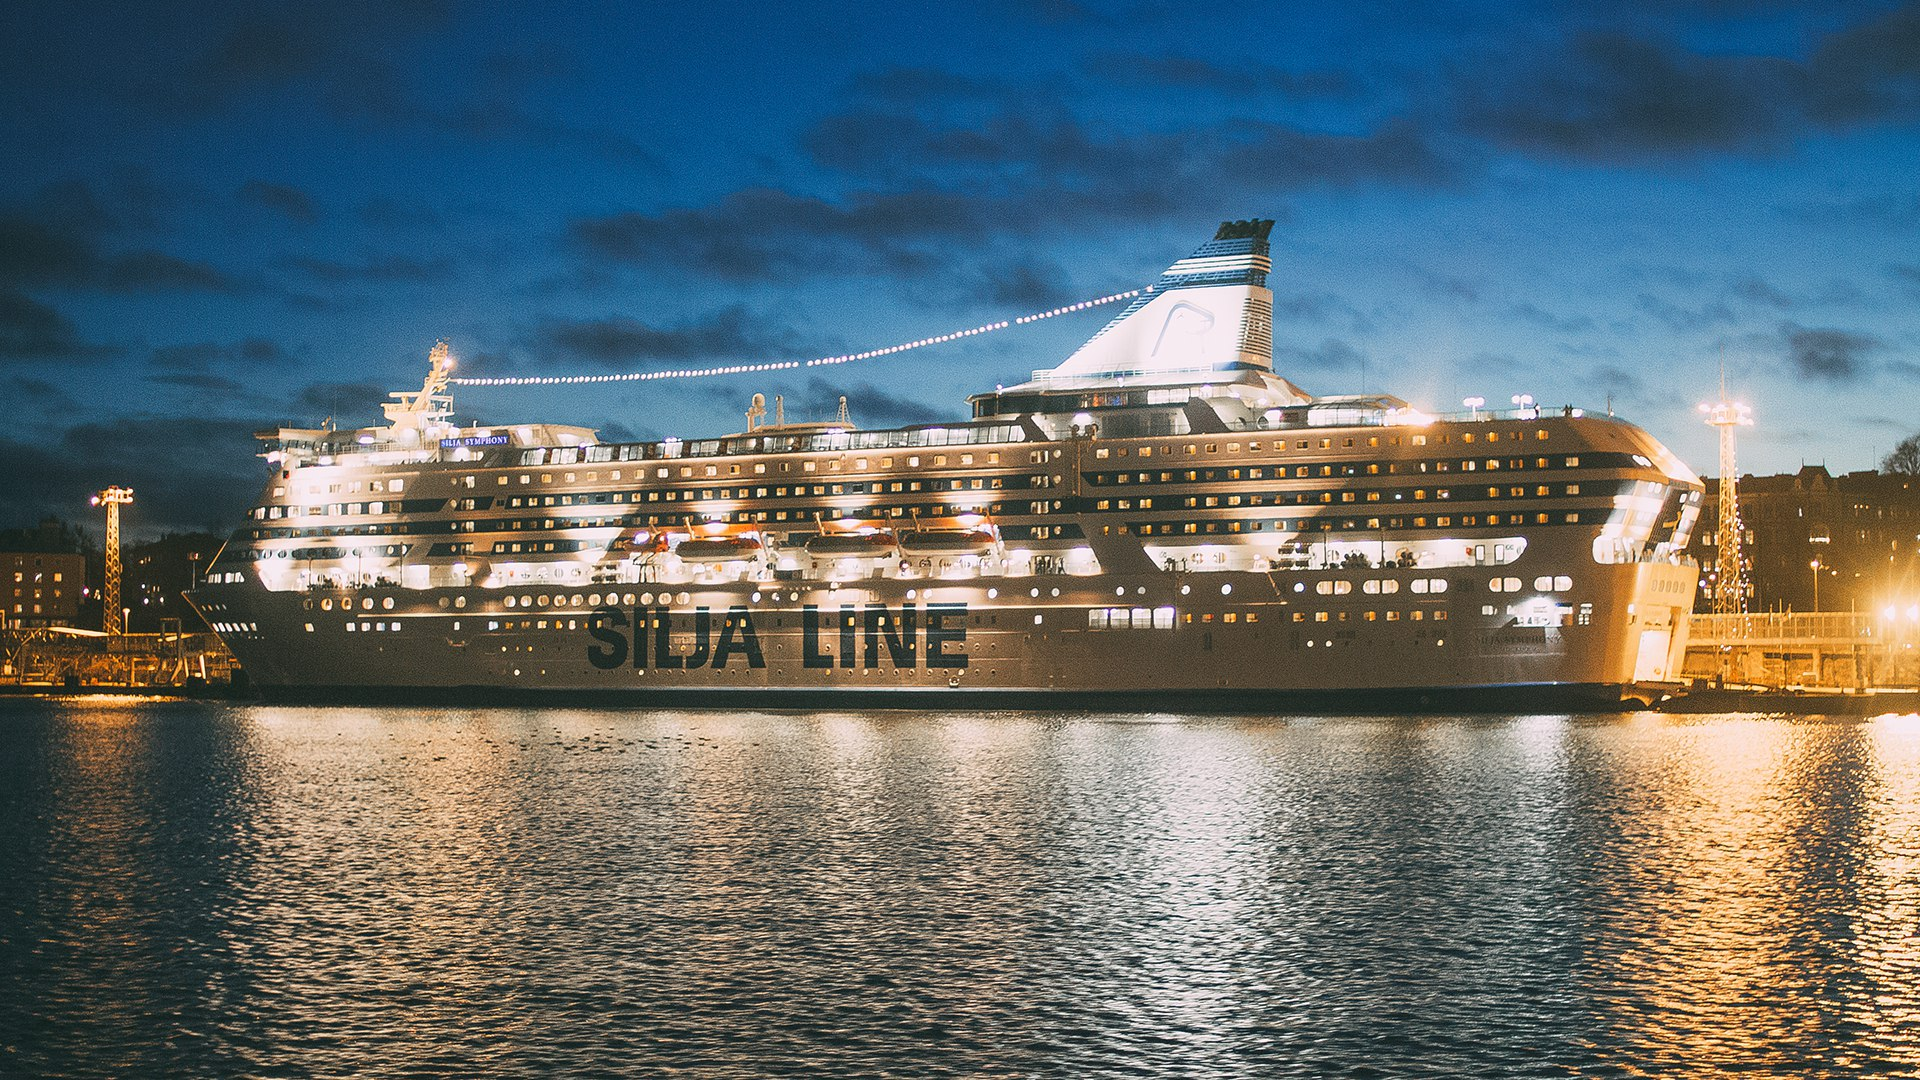 Silja line, Viking lines, паром, корабль, Хельсинки, порт